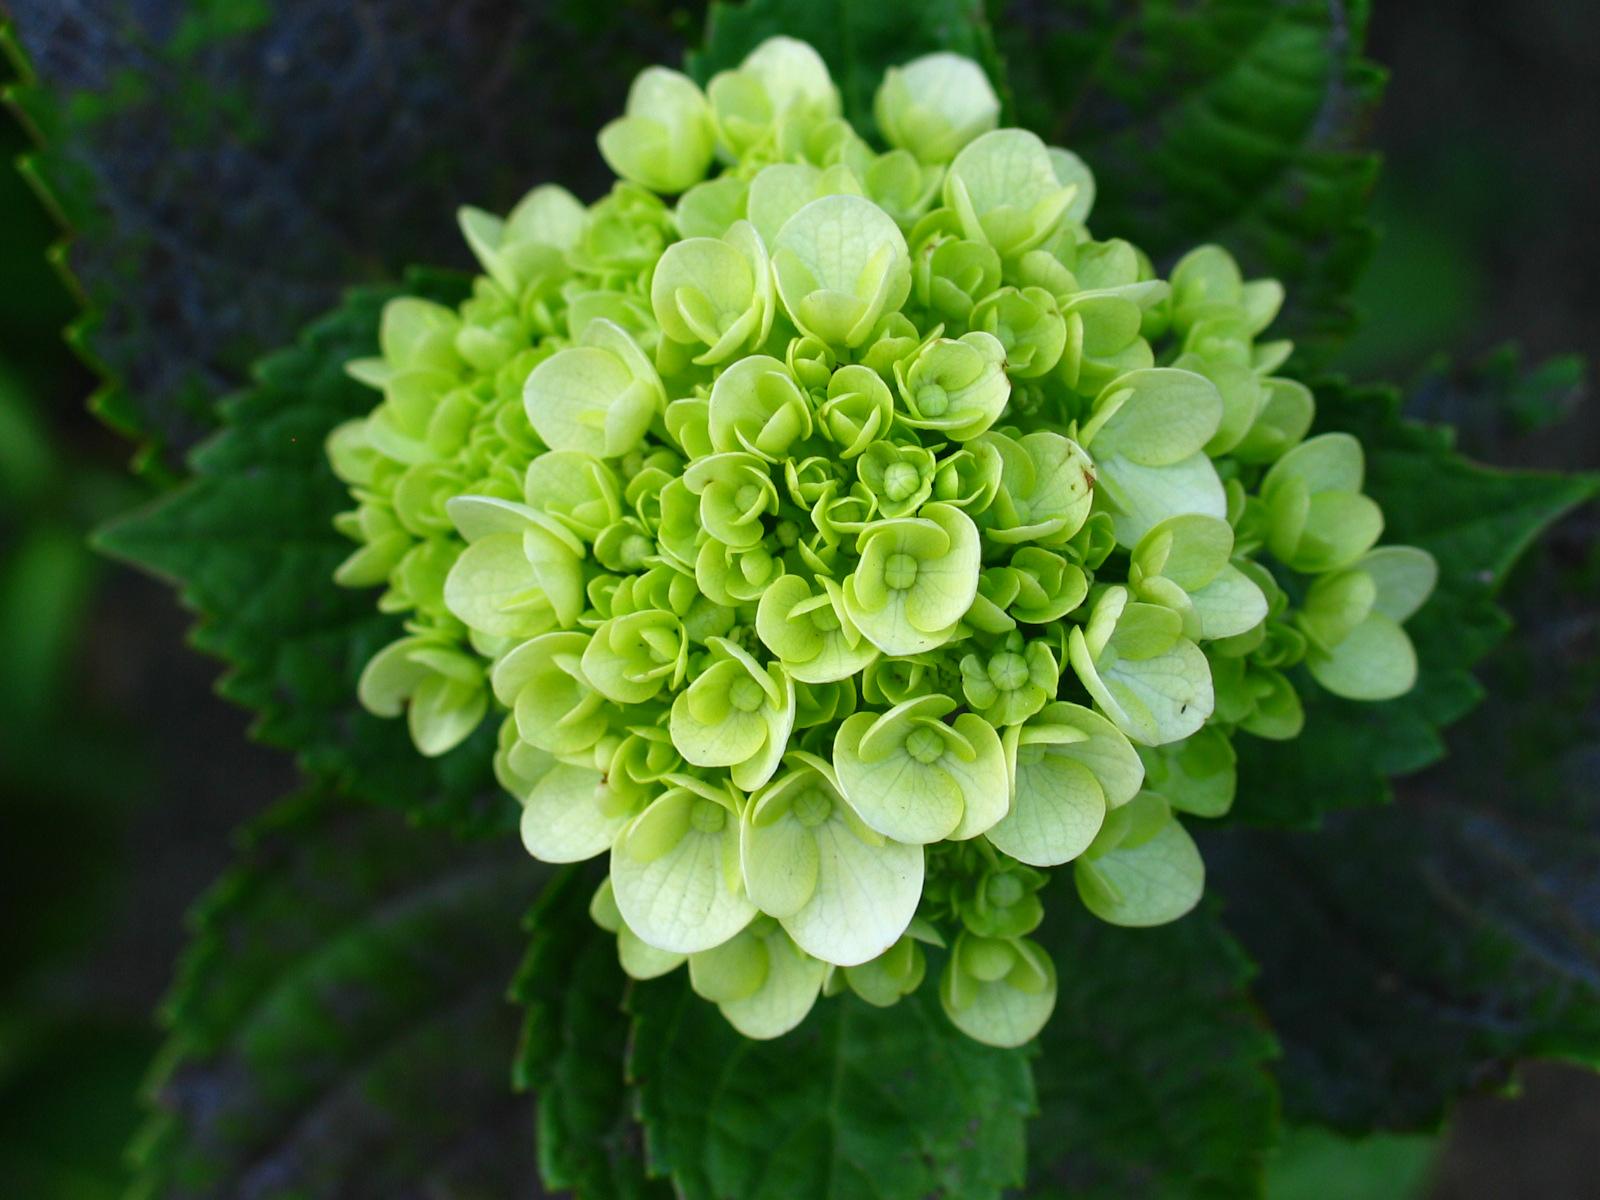 This year s popular green trend Flower PressFlower Press